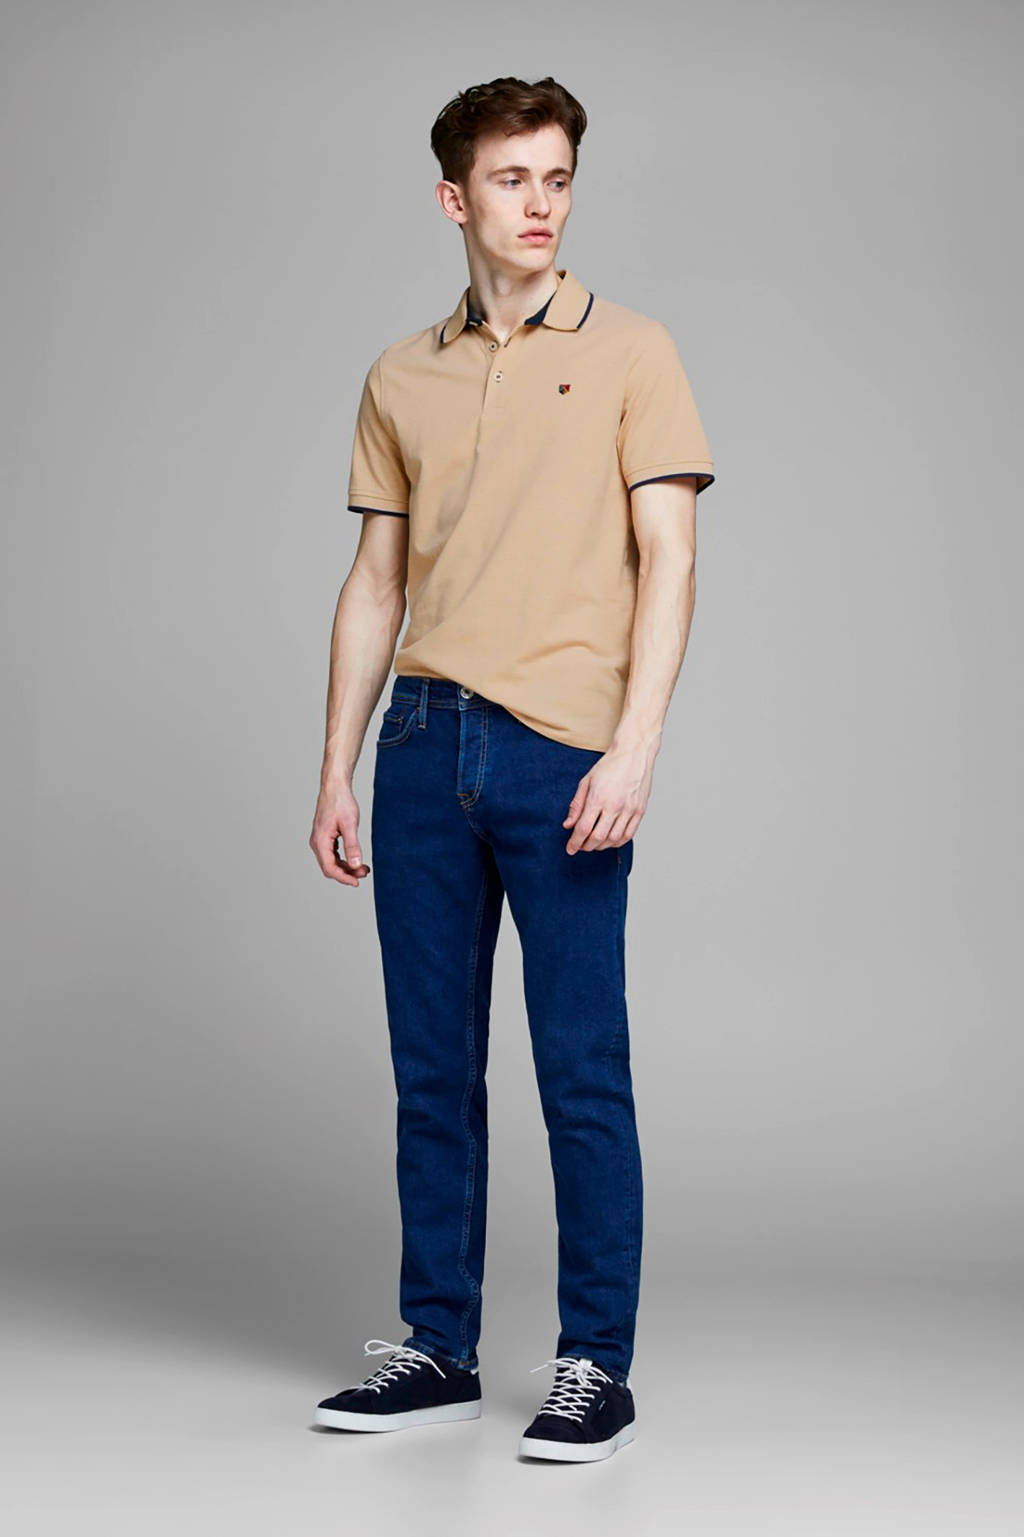 JACK & JONES PREMIUM gemêleerde slim fit polo beige/blauw/wit, Beige/blauw/wit